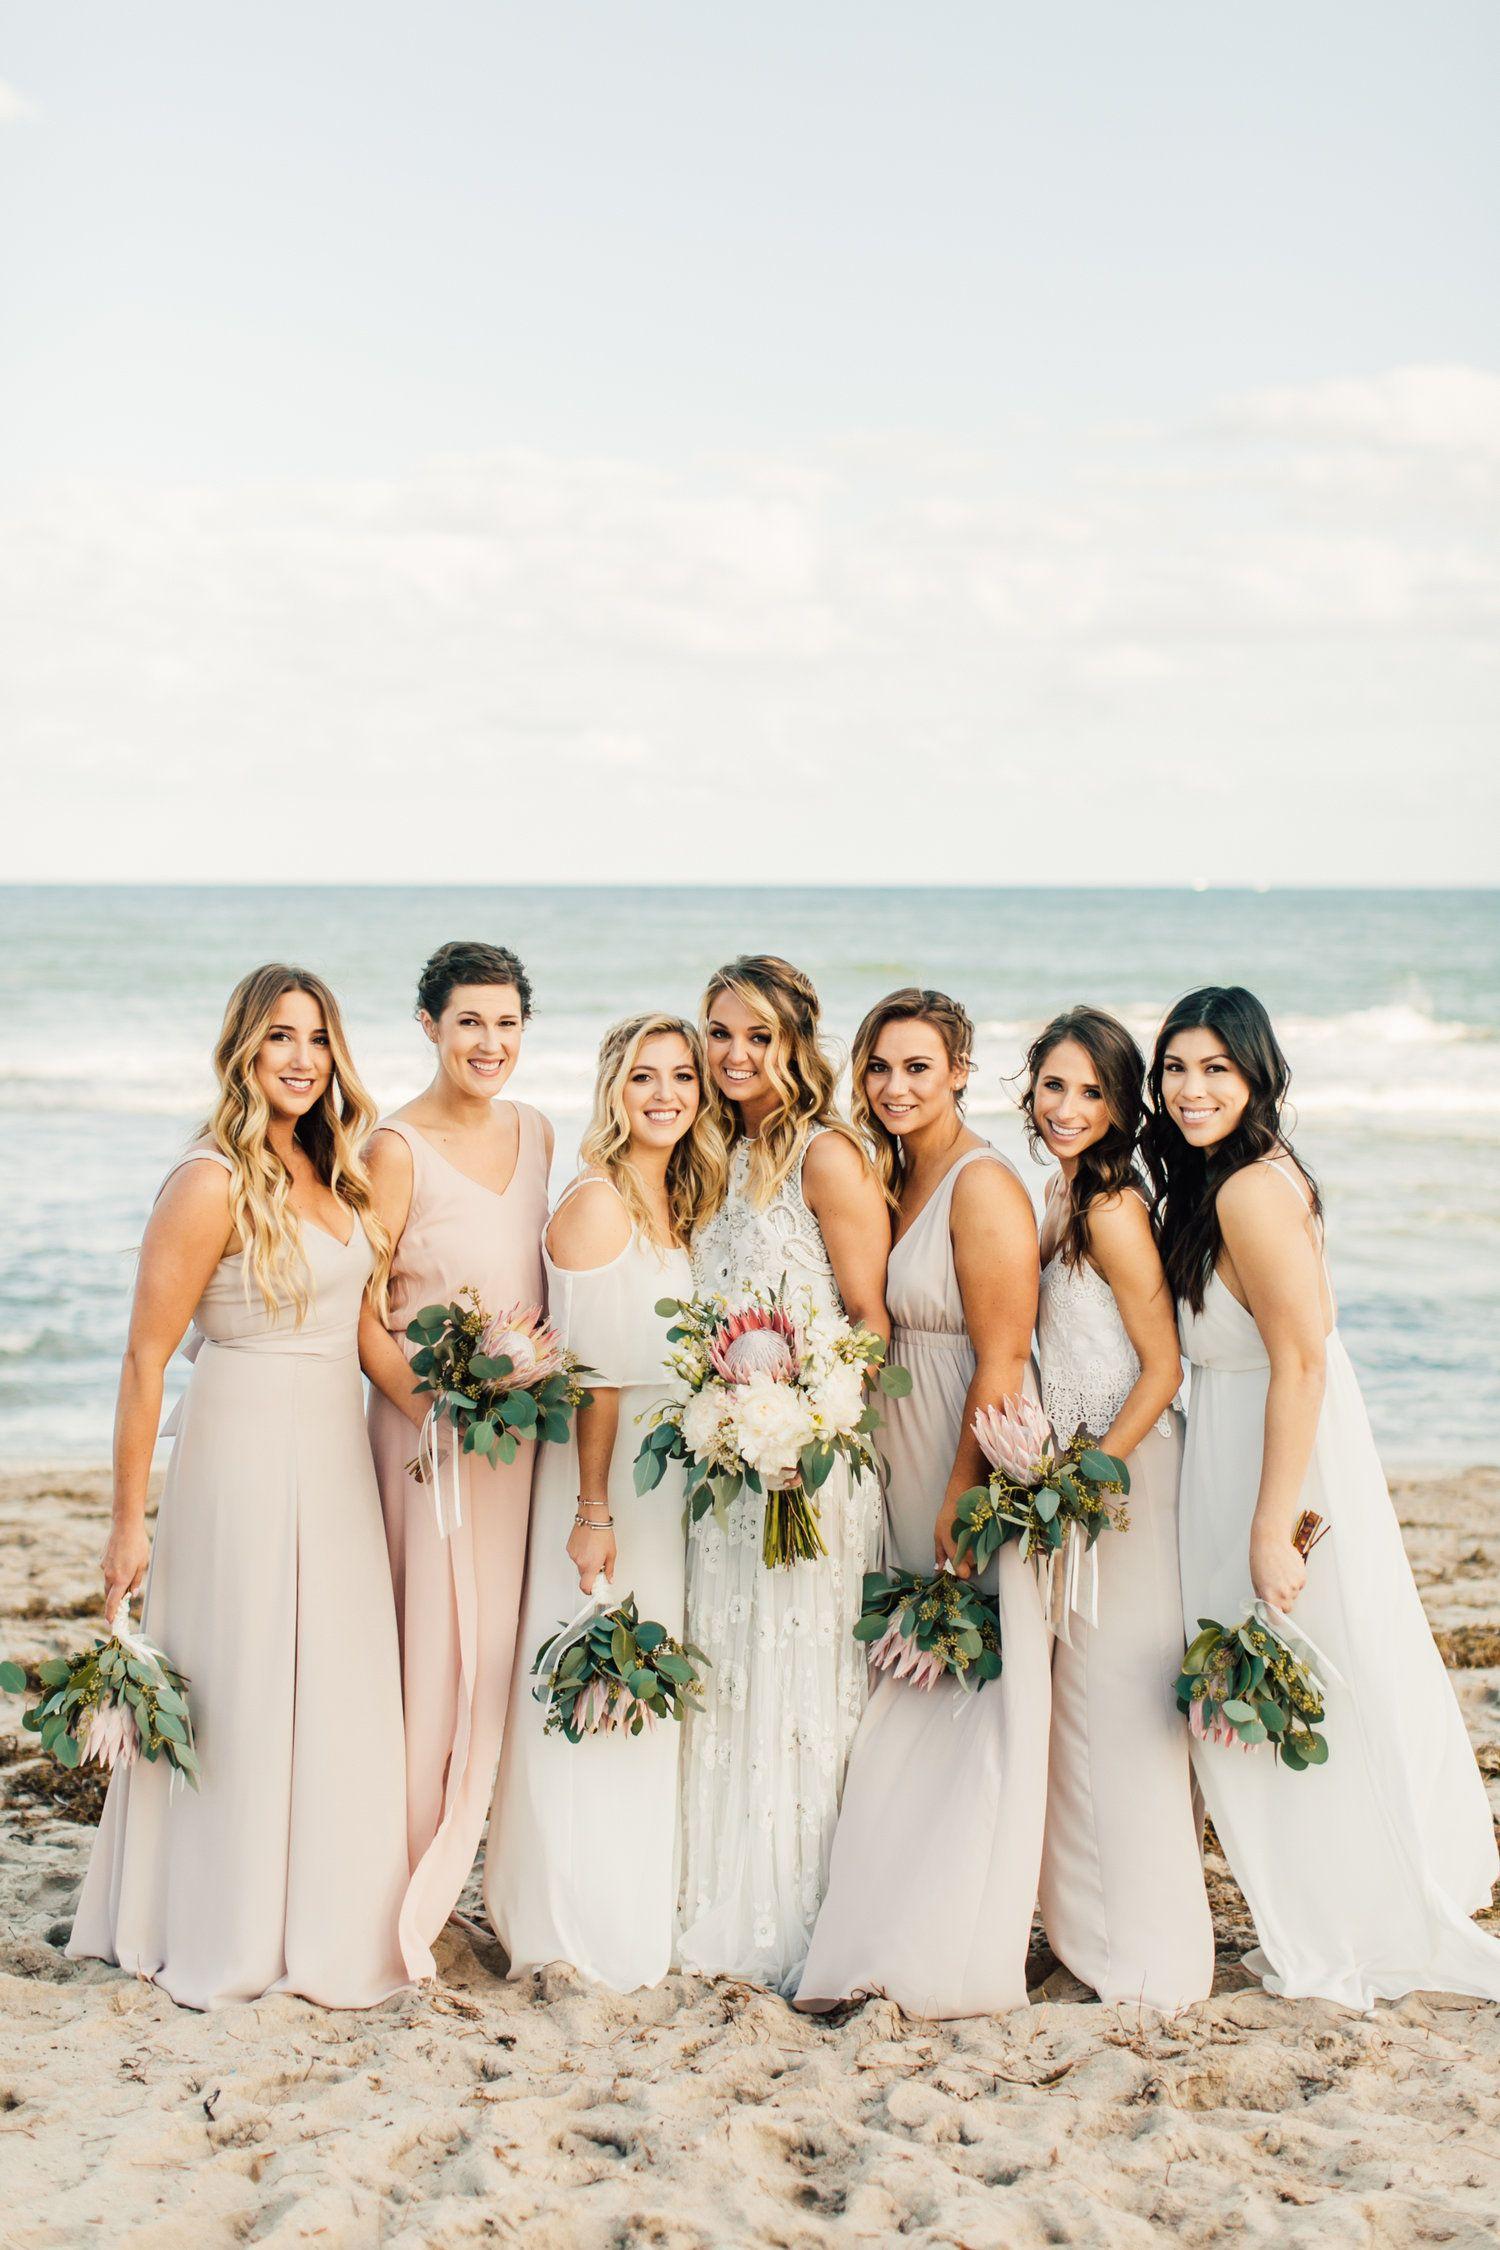 Pin By Jaclyn Padovano On Wedding Beach Wedding Bridesmaid Dresses Beach Bridesmaid Dresses Beach Wedding Dress